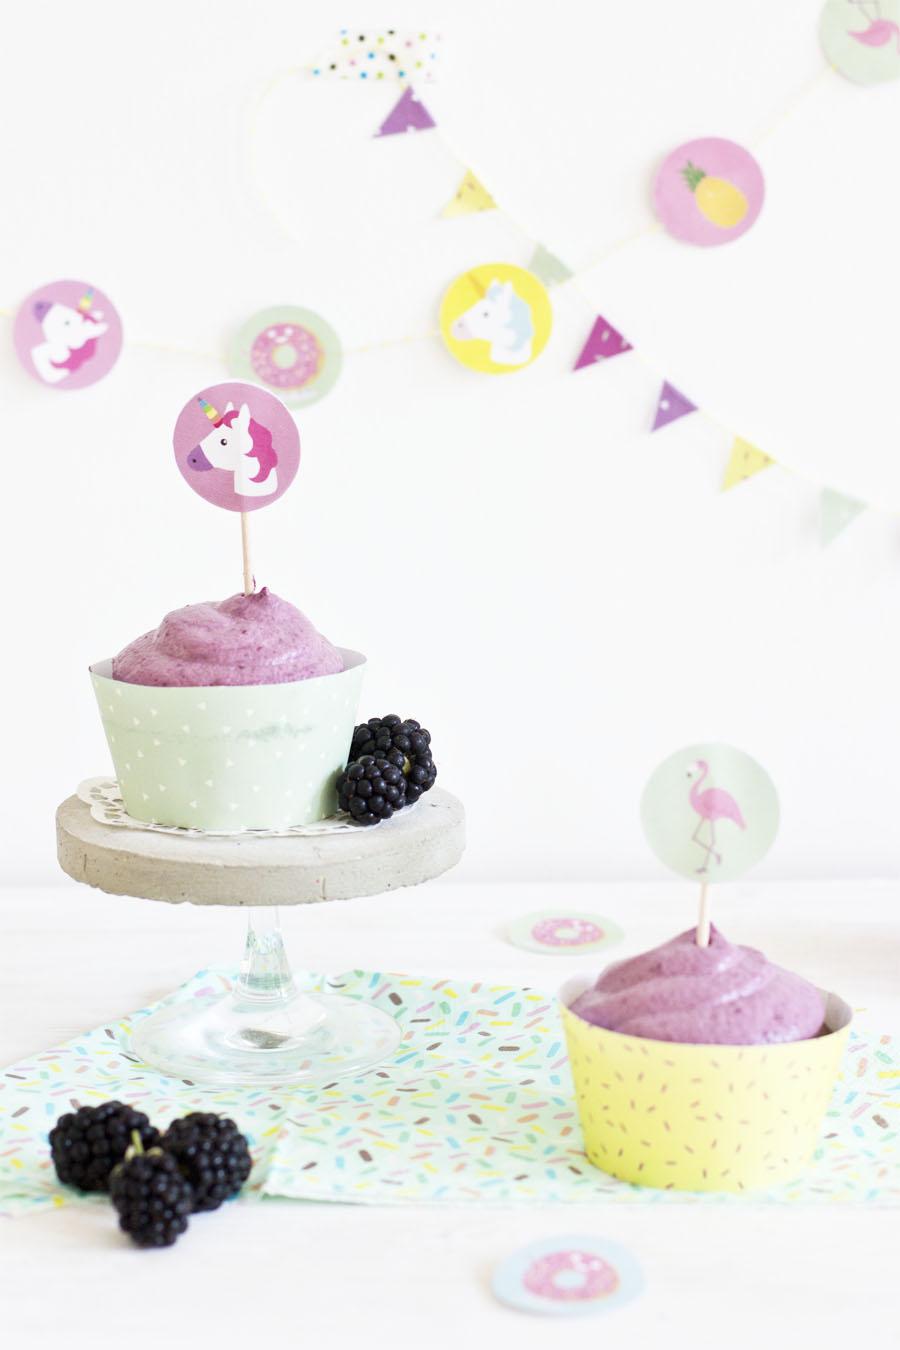 Blackberry chocolate cupcake recipe   LOOK WHAT I MADE ...